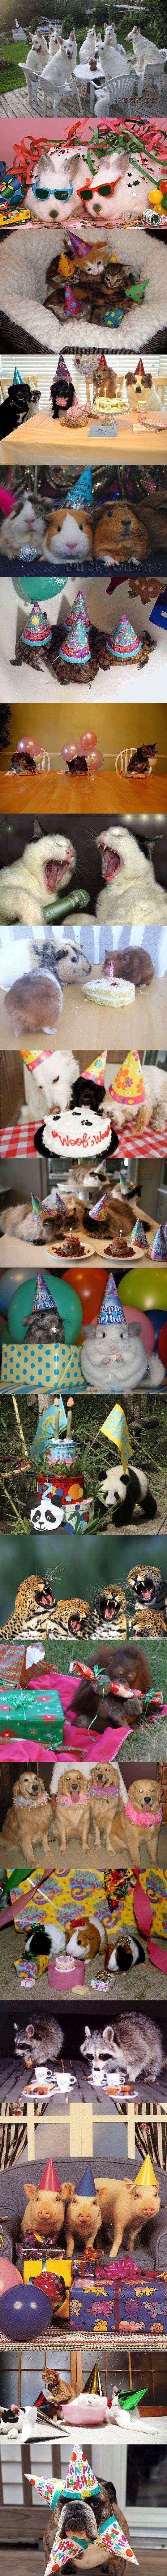 party+animals_54dc68_4476366